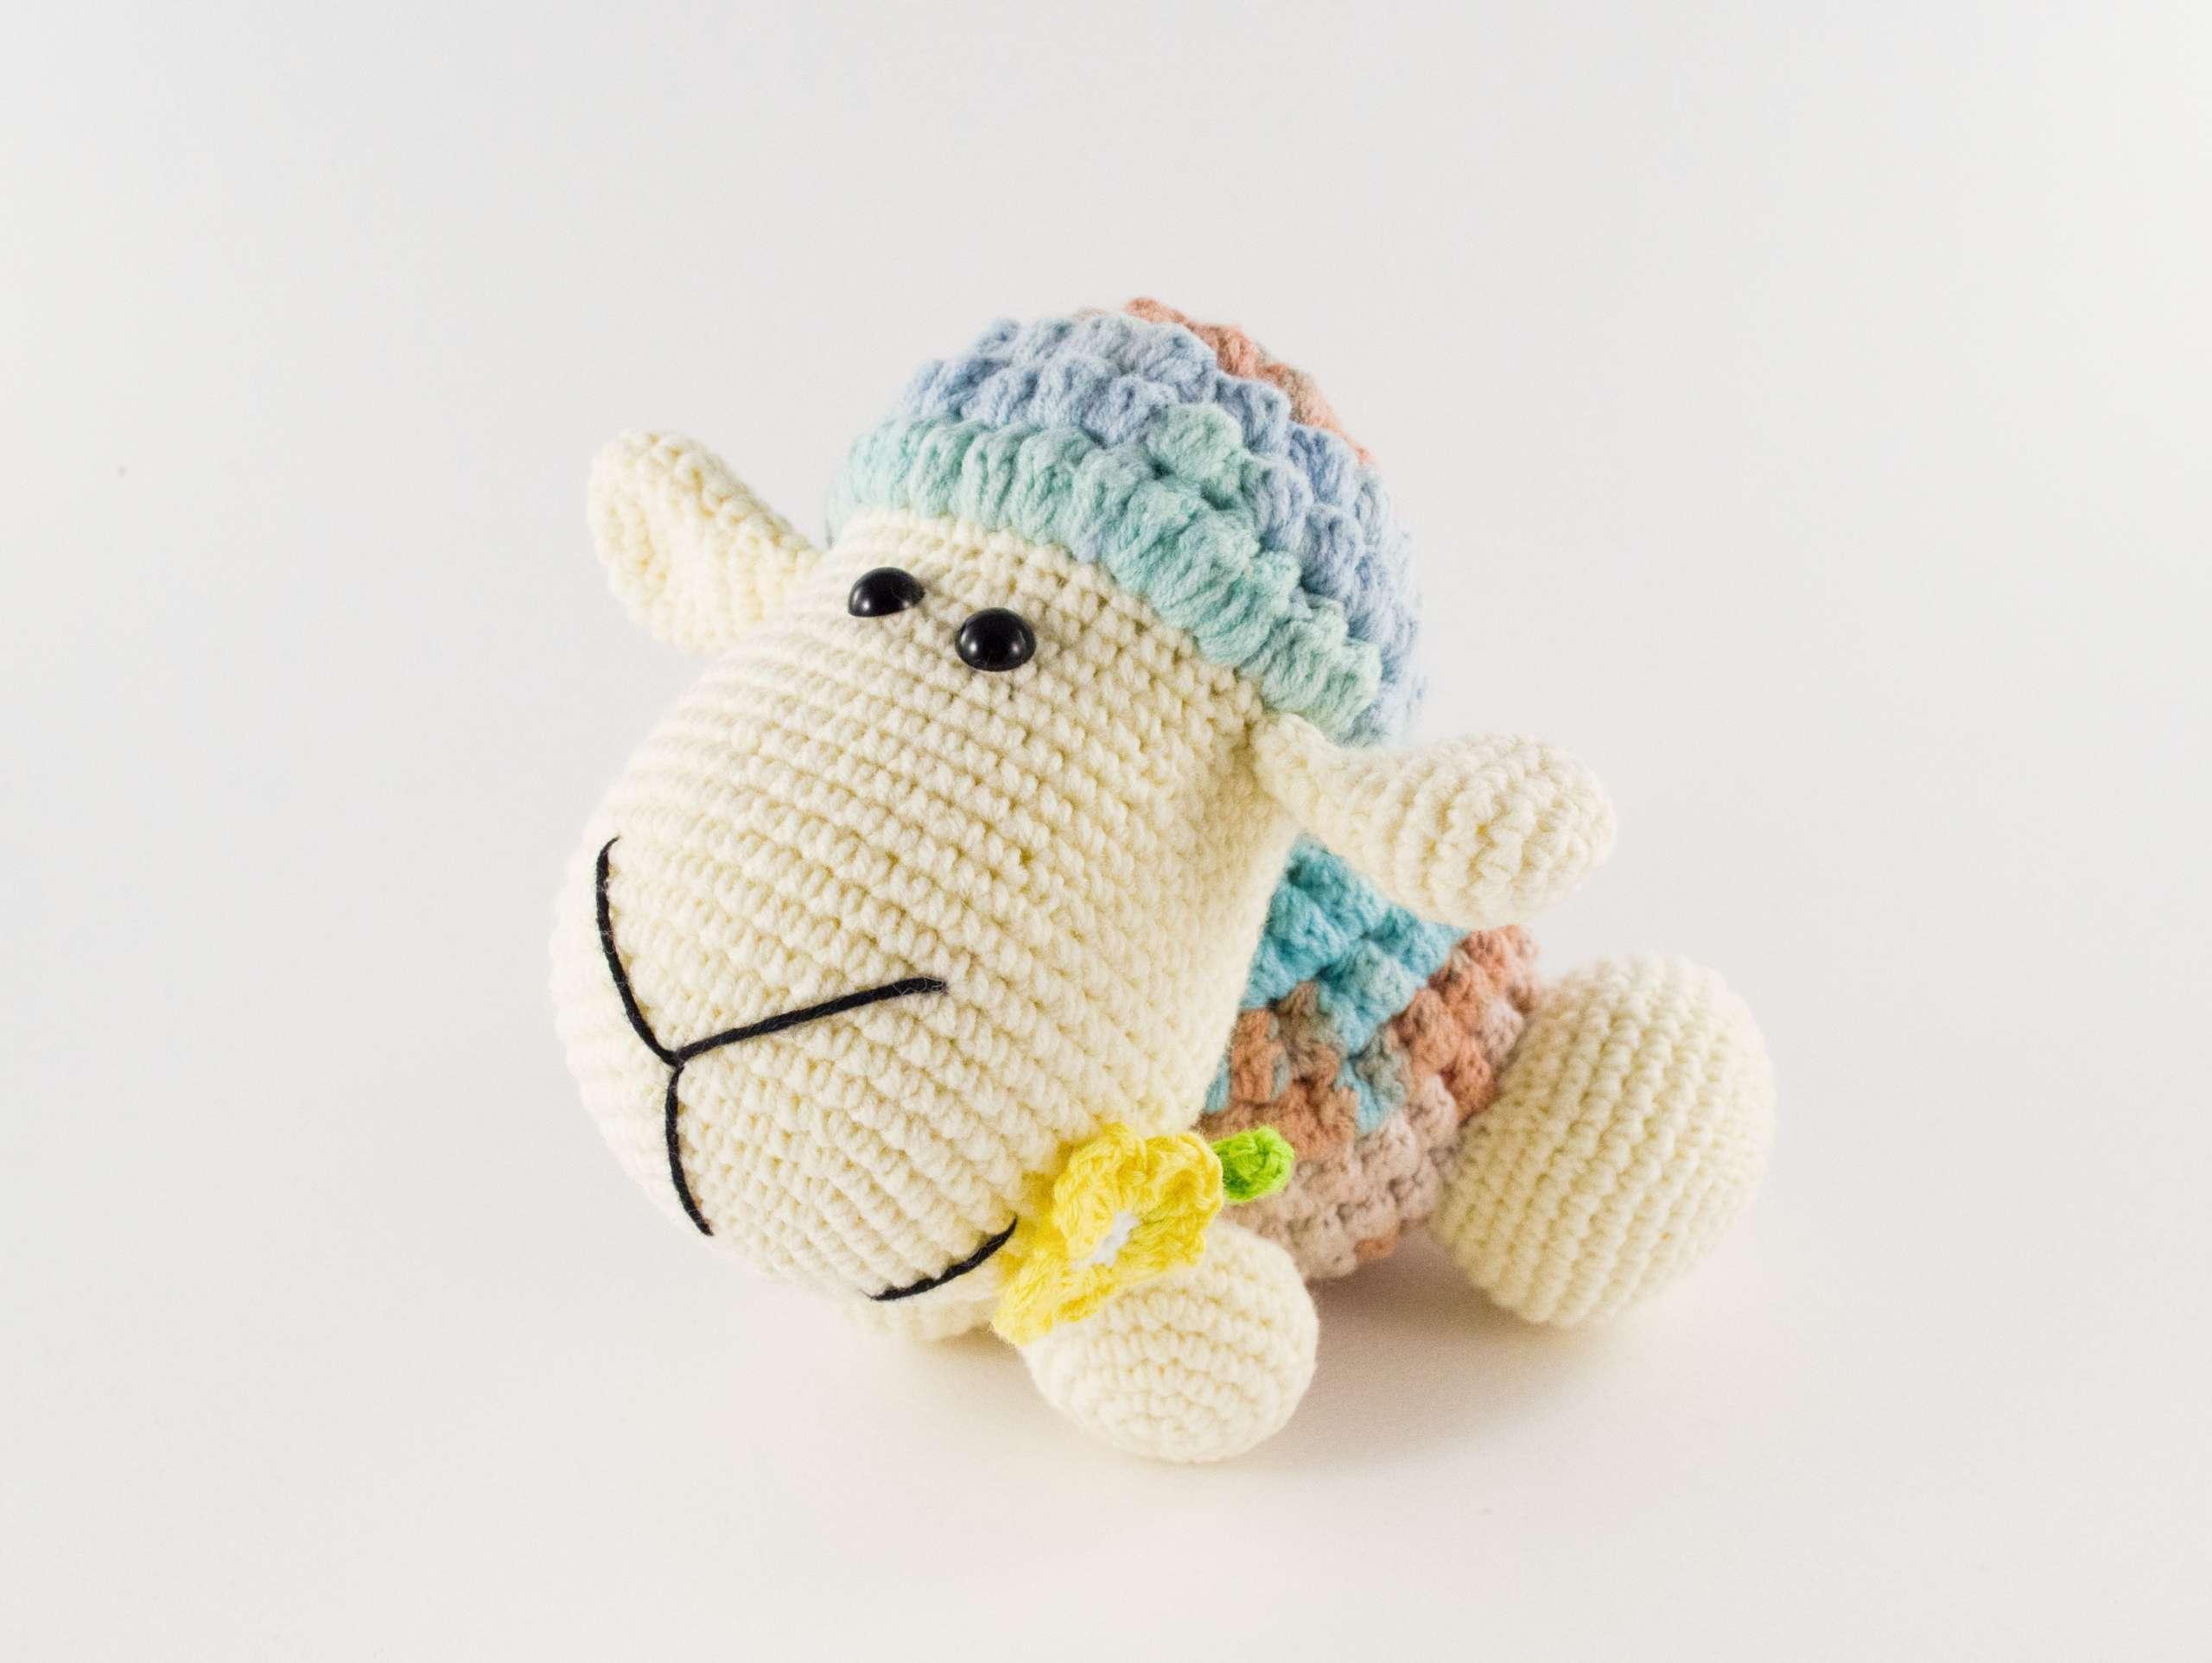 Cartoon airplane crochet pattern - Amigurumi Today | 1444x1920